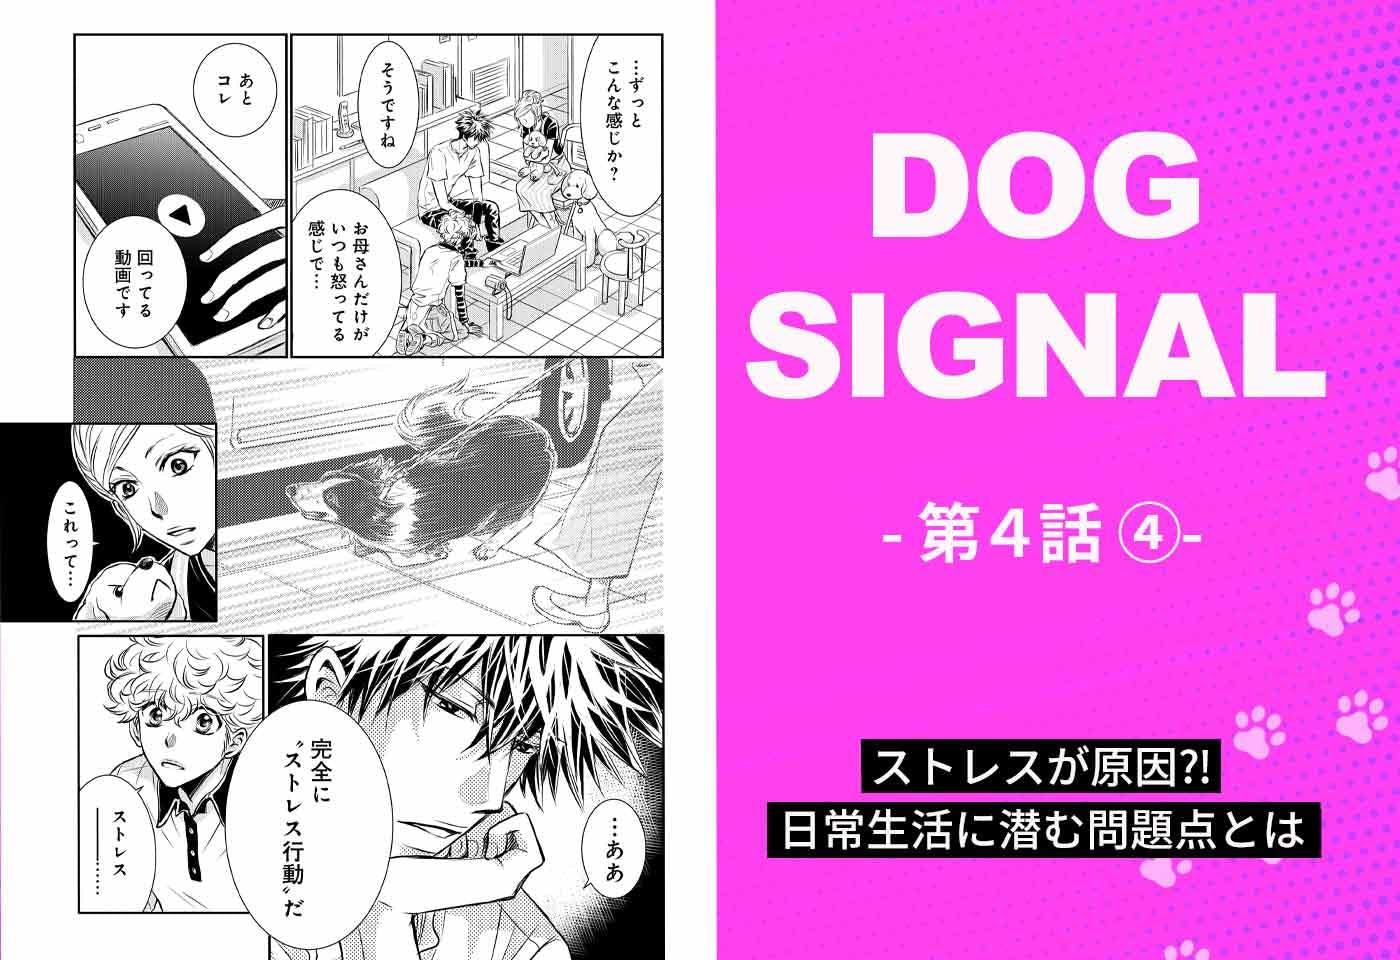 『DOG SIGNAL』4話目 4/4